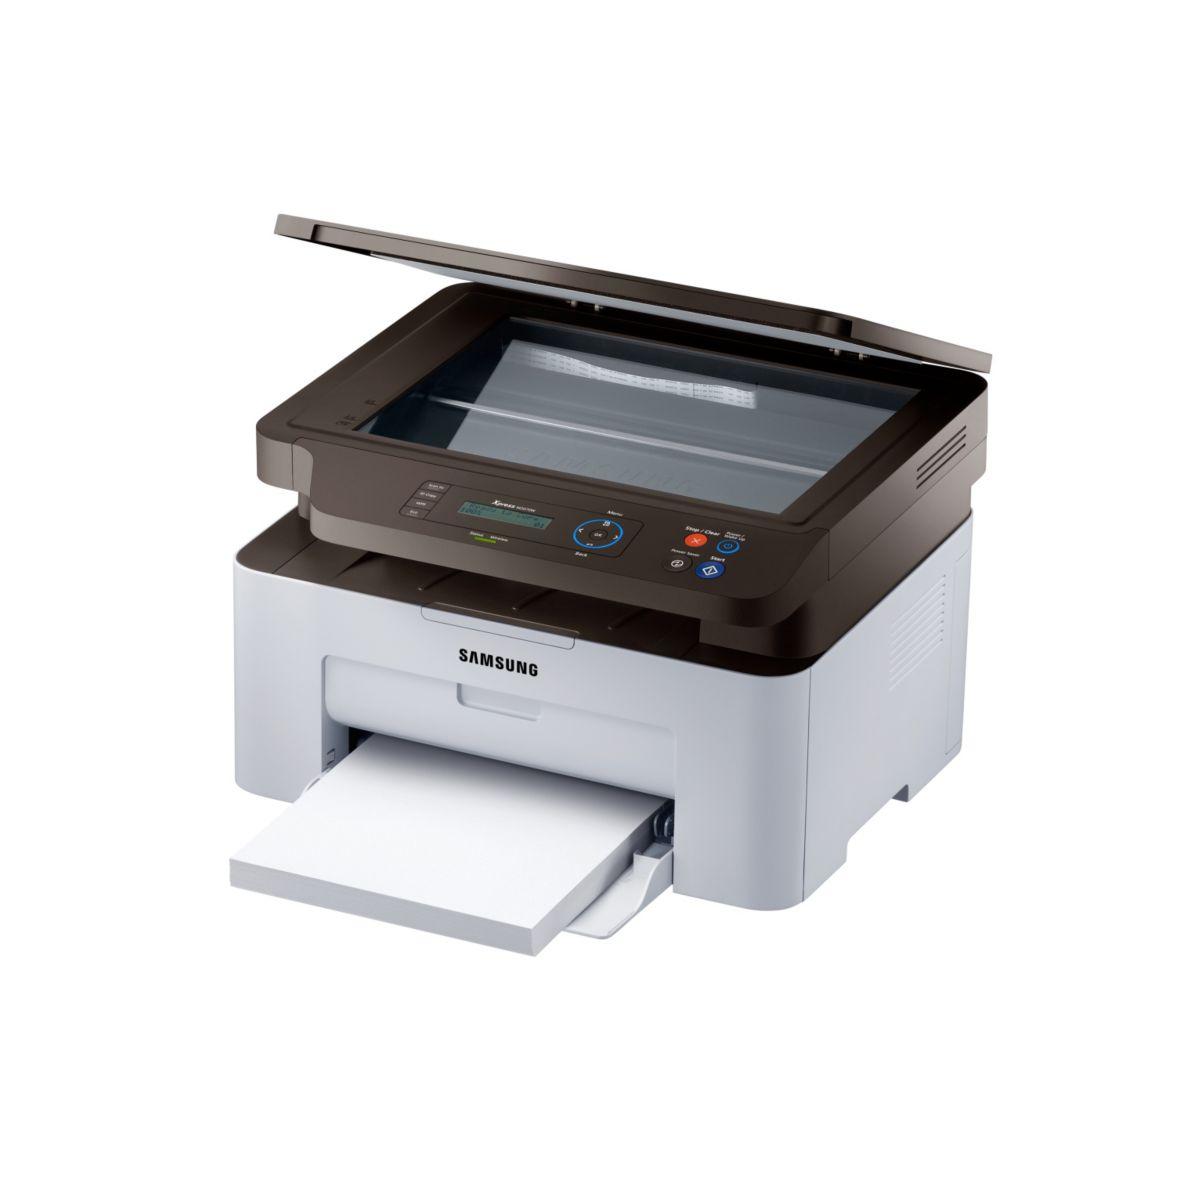 Imprimante multifonction laser monochrome samsung sl-m2070w - livraison offerte : code liv (photo)